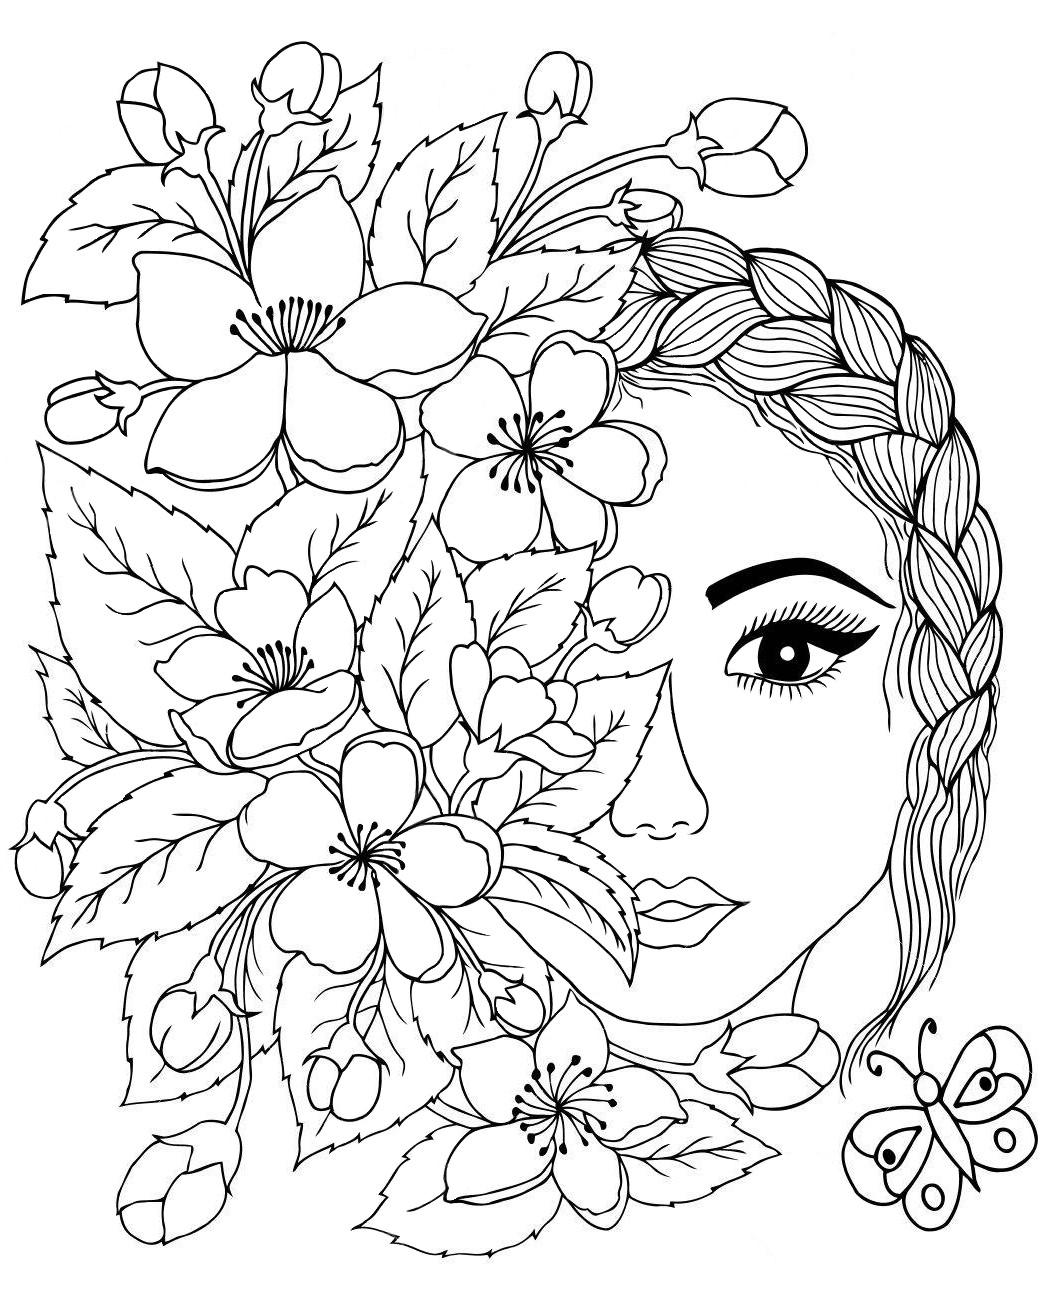 Арт терапия лицо с цветами - Люди и лица - Раскраски ...